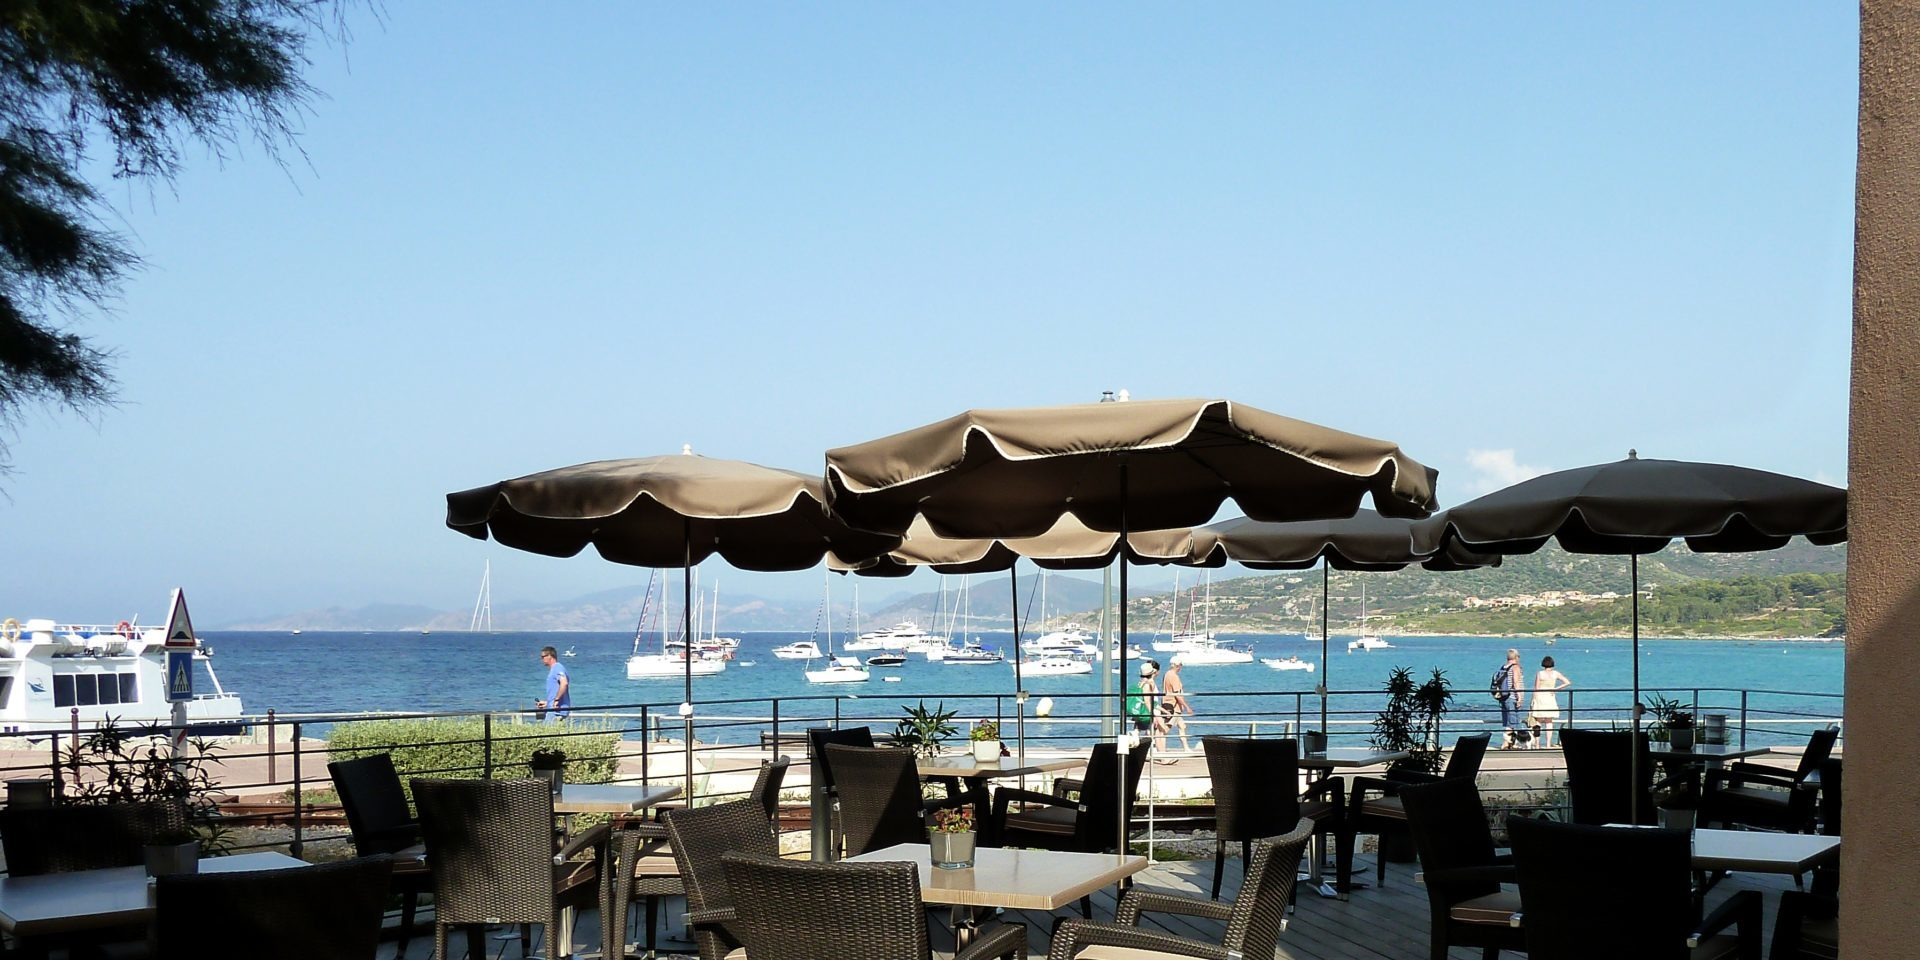 Hotel Perla Rossa Ile Rousse Corsica Frankrijk SkiMaquis OntdekCorsica terras zeezicht boten promenade boulevard